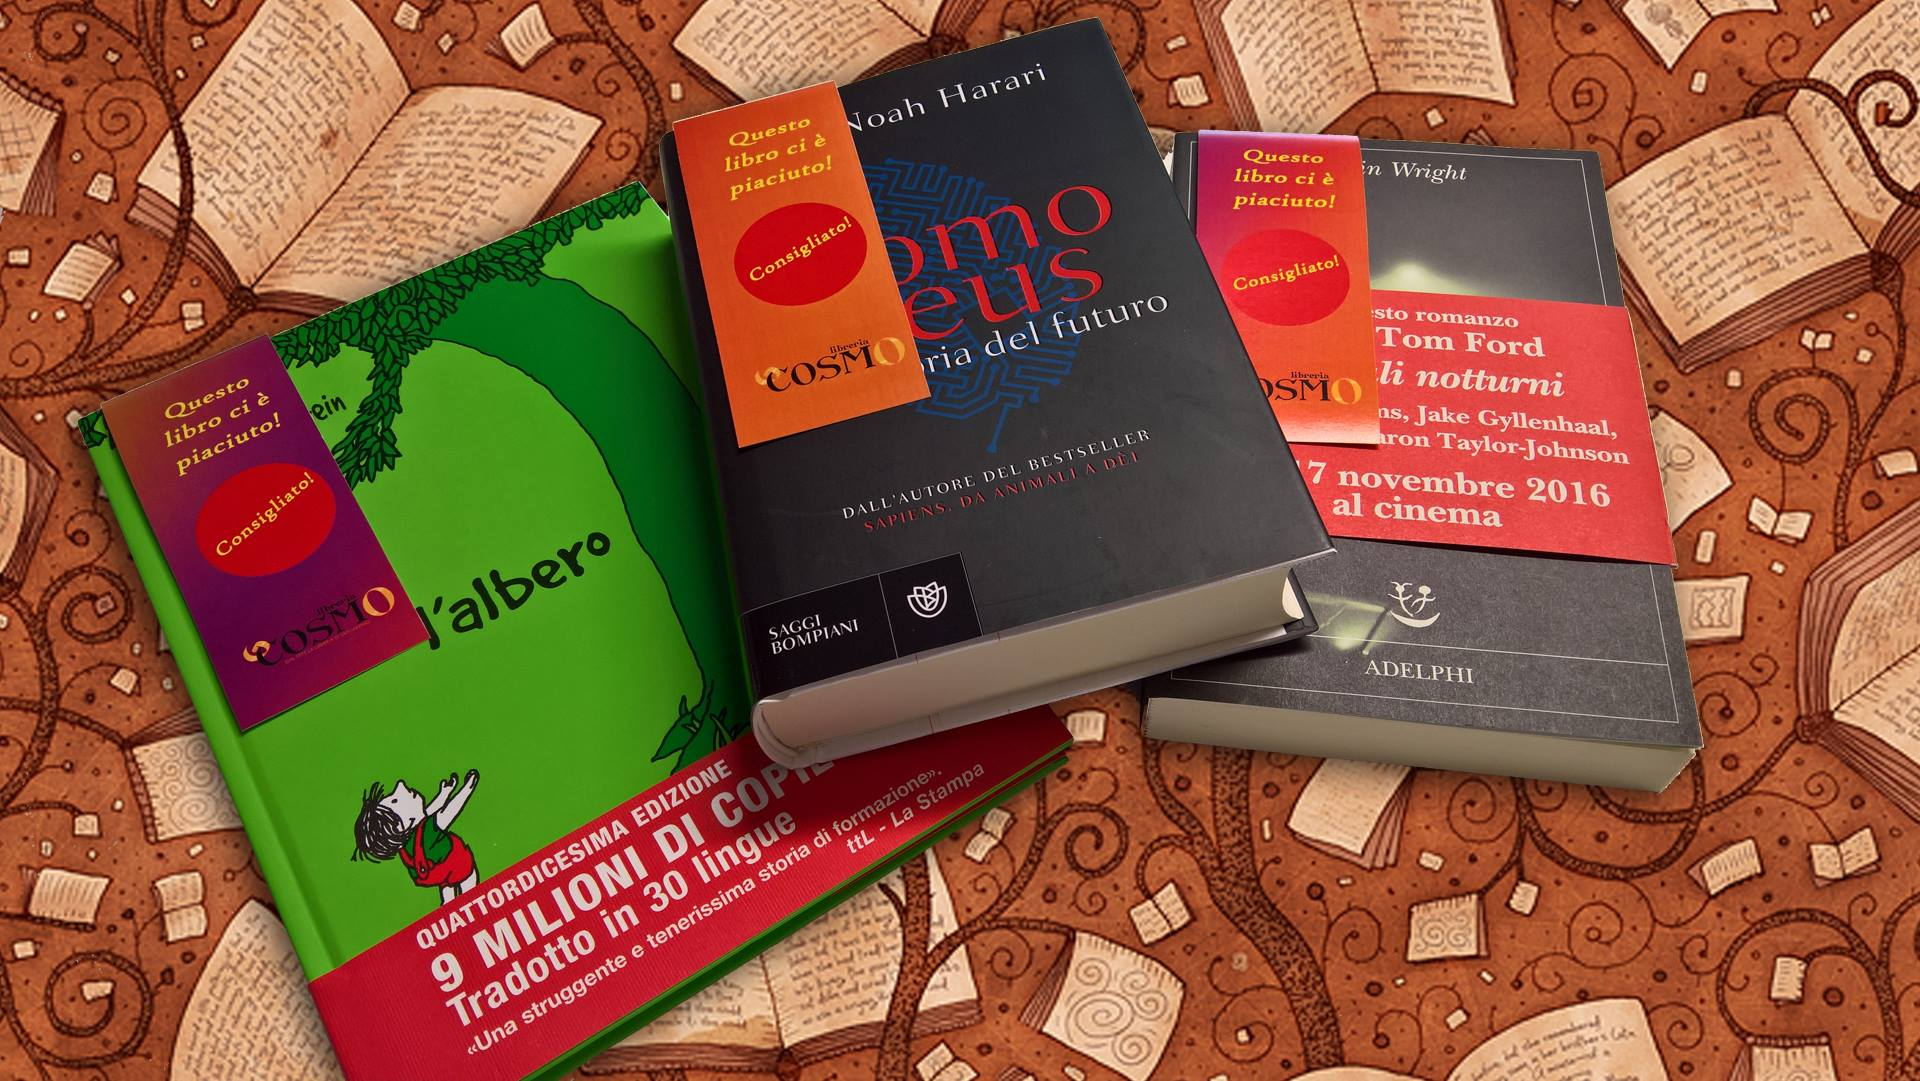 cosmo-libri-treesessanta-